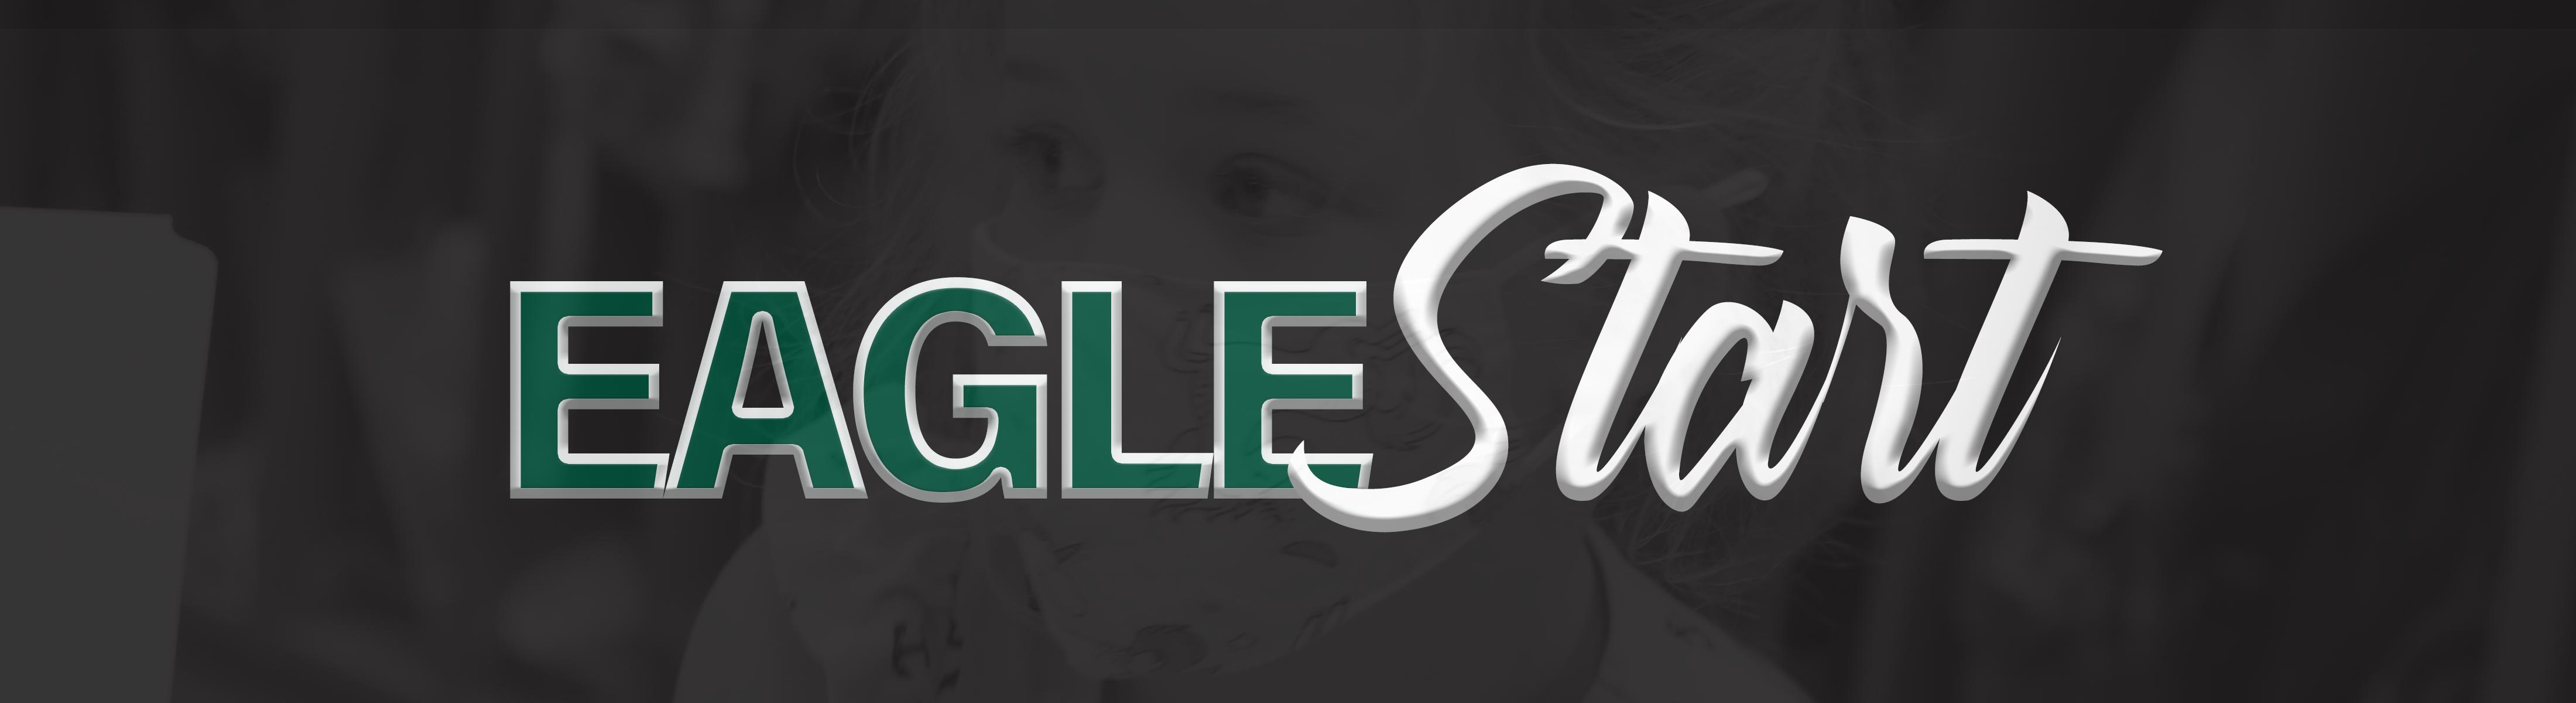 eagle start